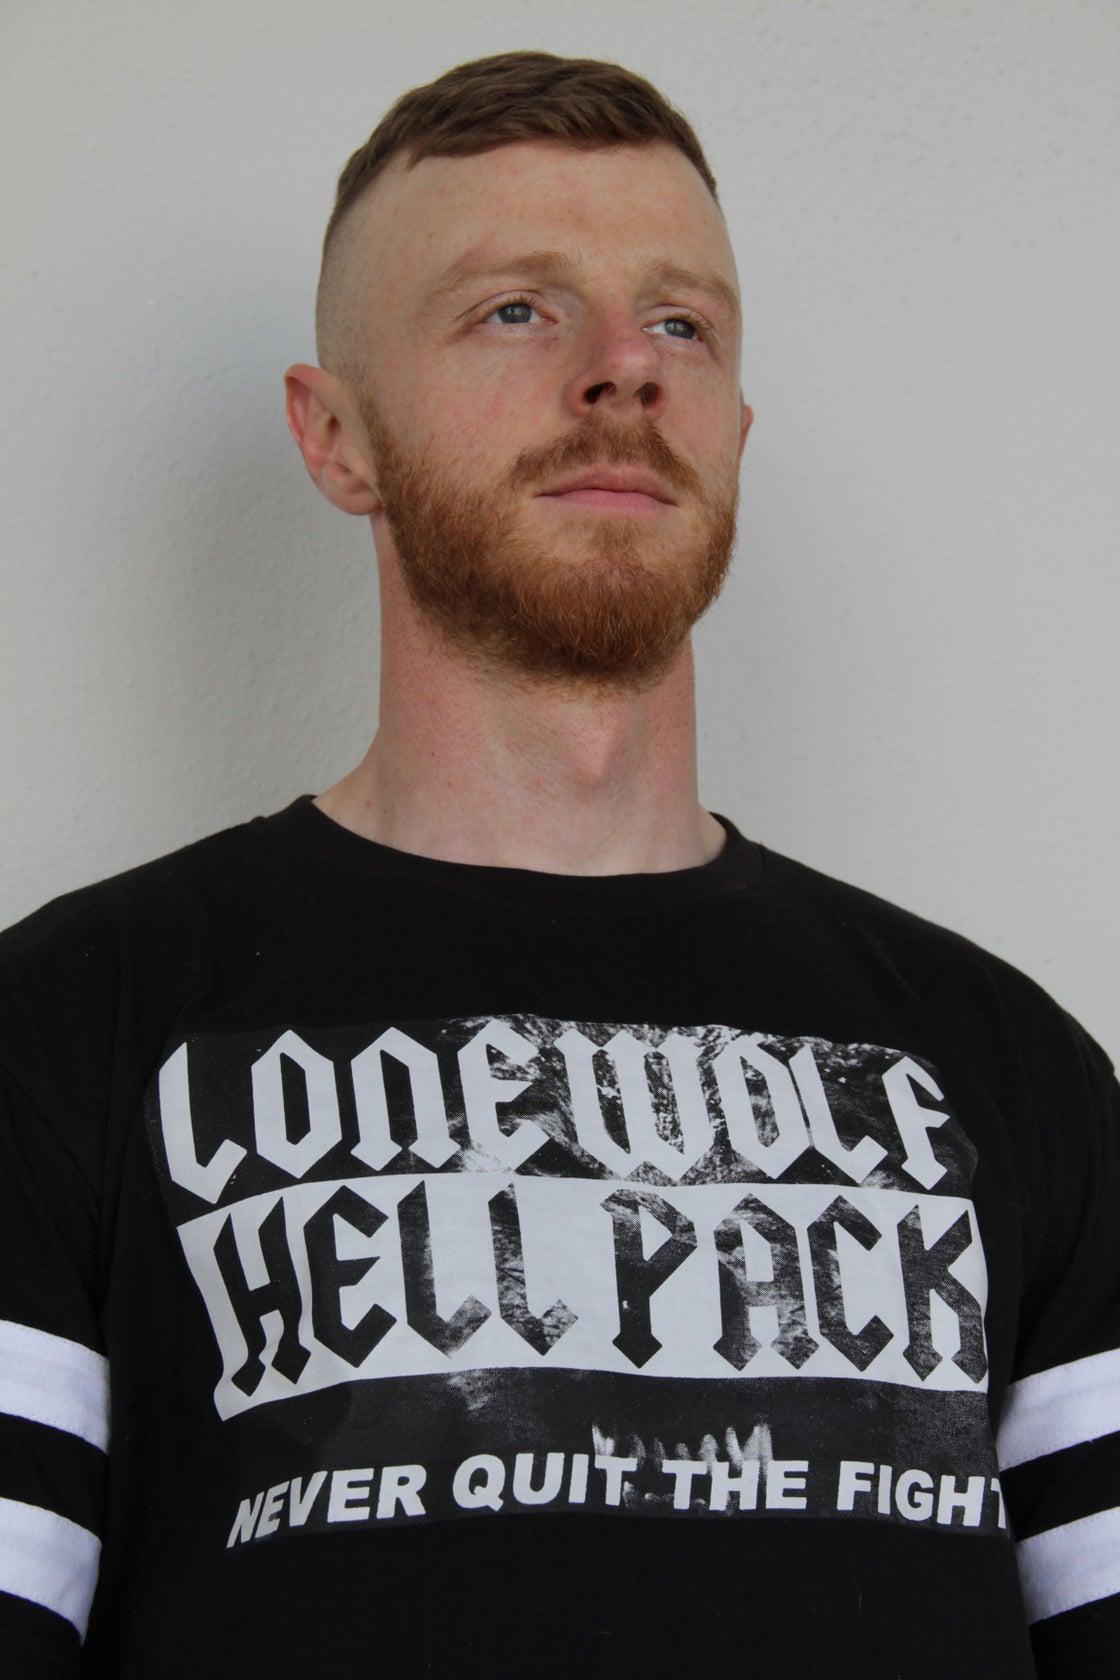 Image of LoneWolf HellPack Tee